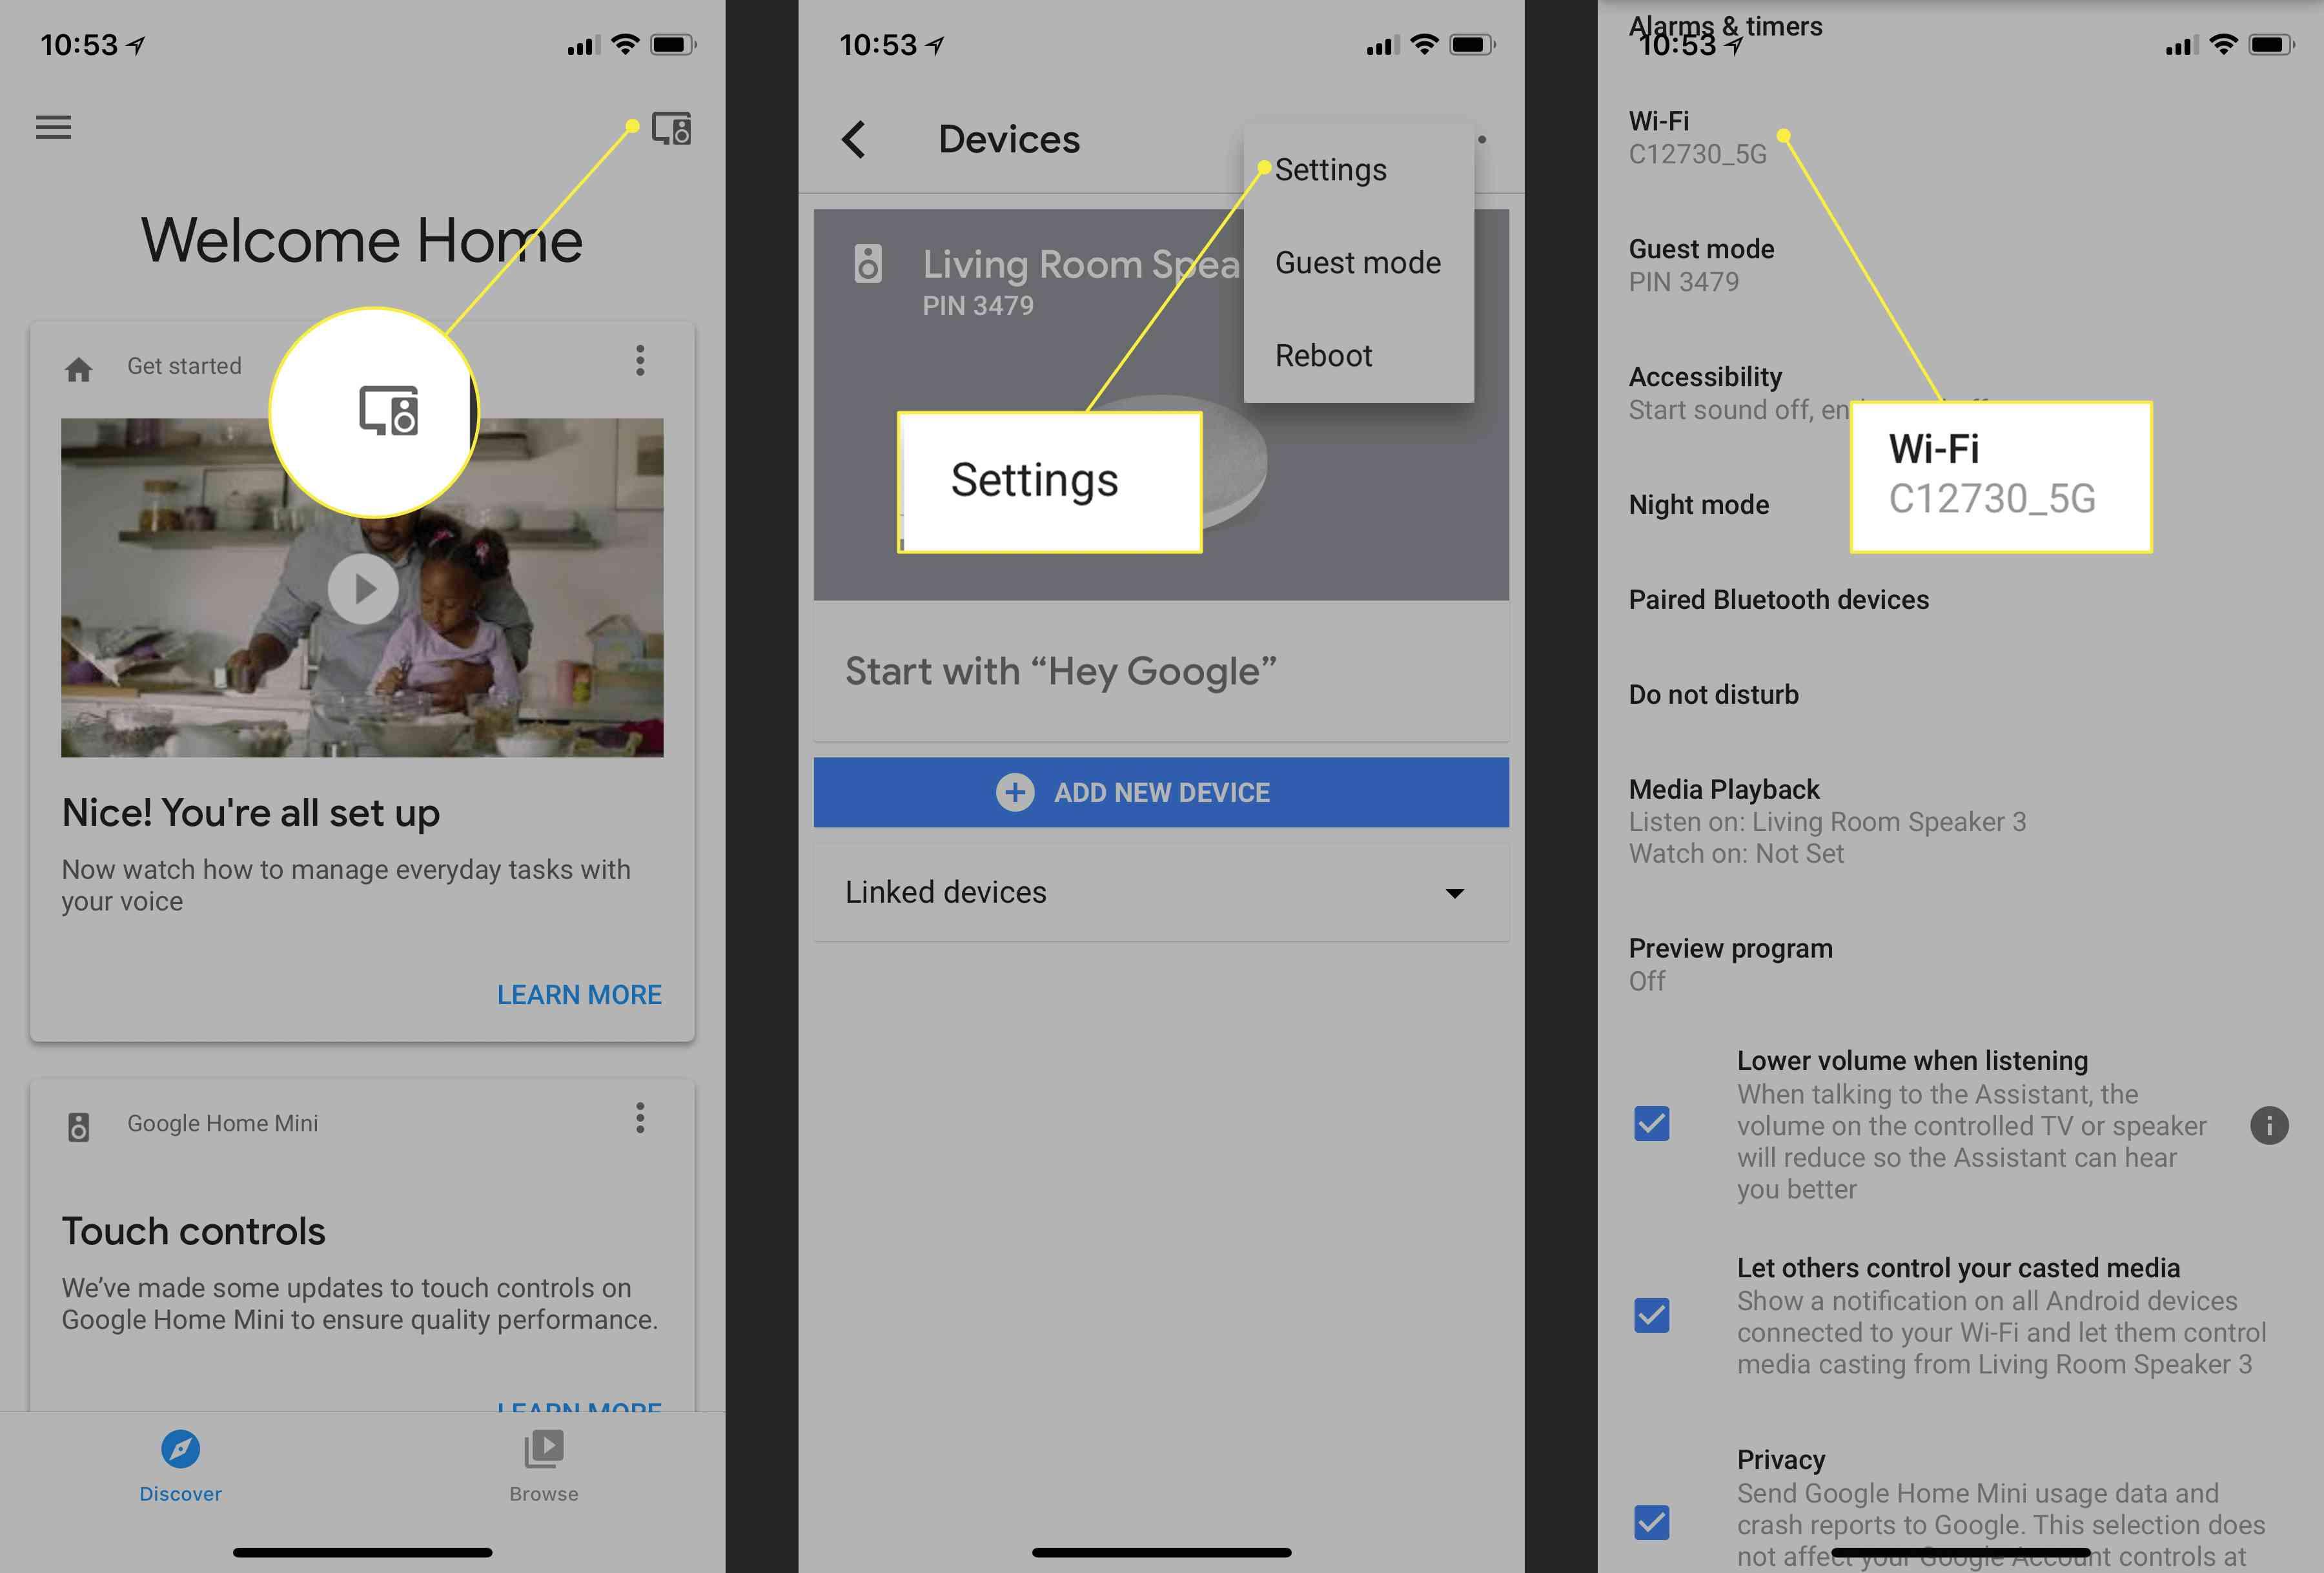 The Device menu, Settings, and Wi-Fi options